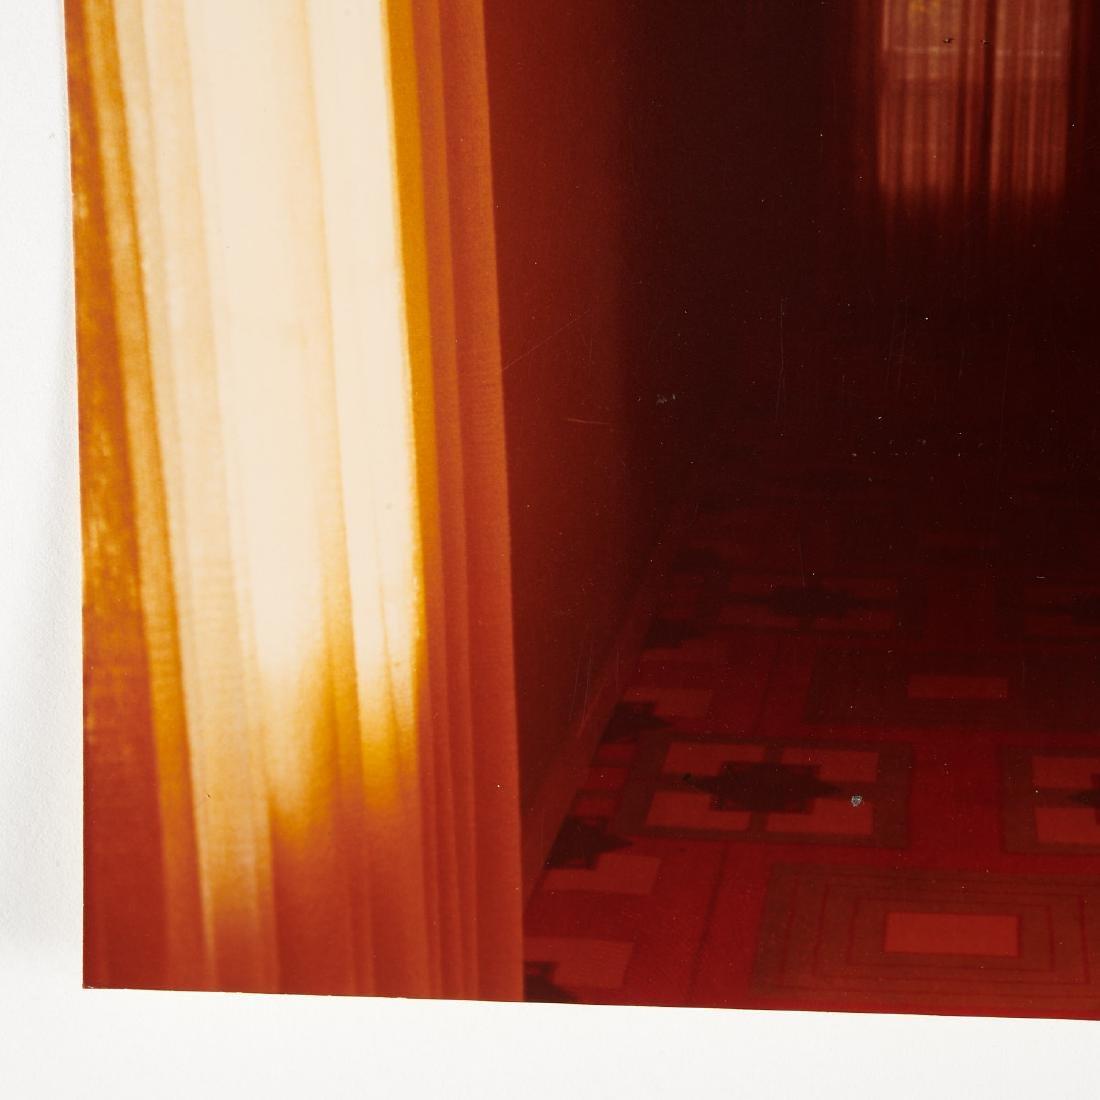 David Hockney, photograph - 3